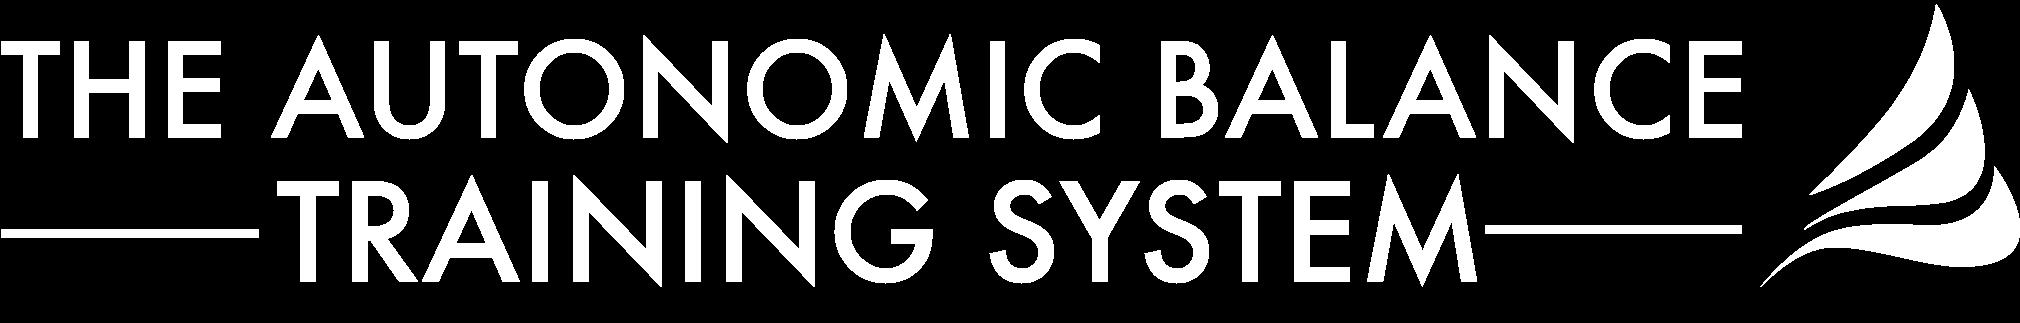 abtrainingsystem